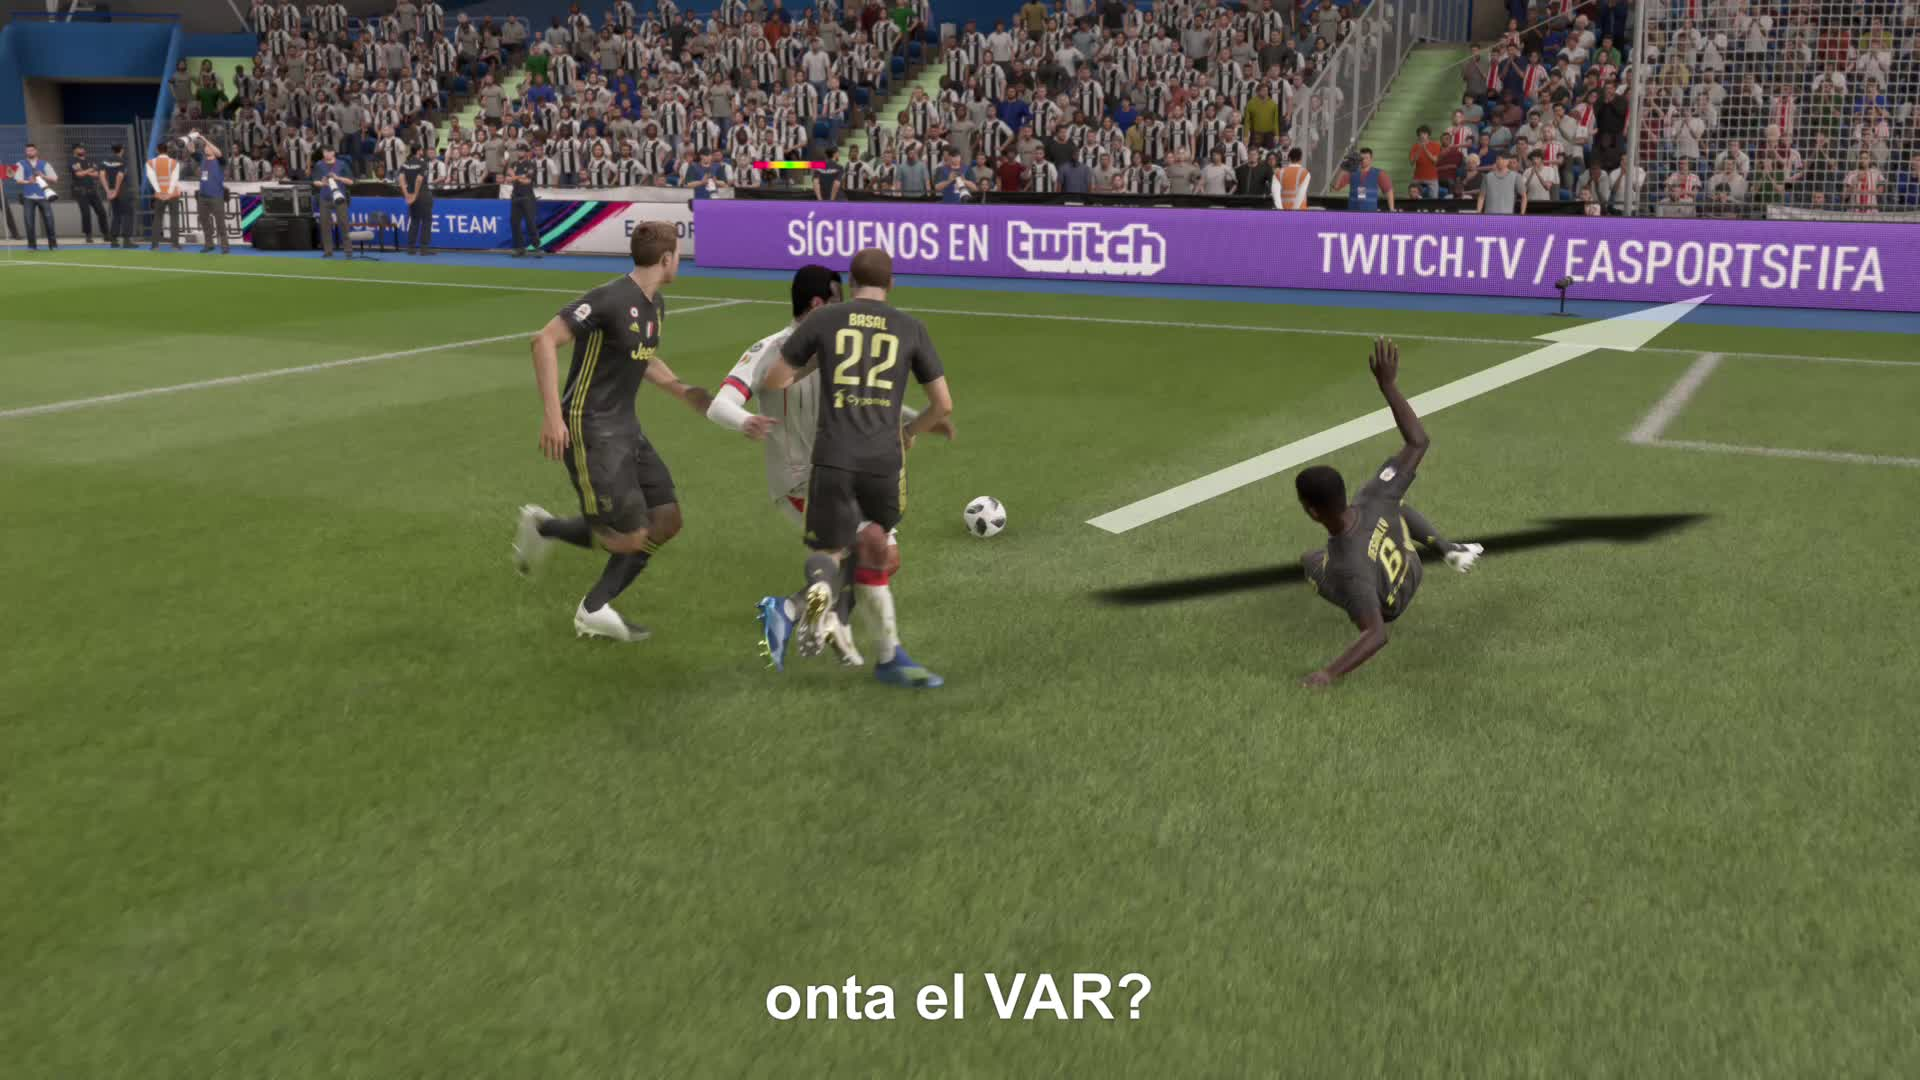 FIFA19, HGS ZorRiTo9, gamer dvr, xbox, xbox one, var GIFs